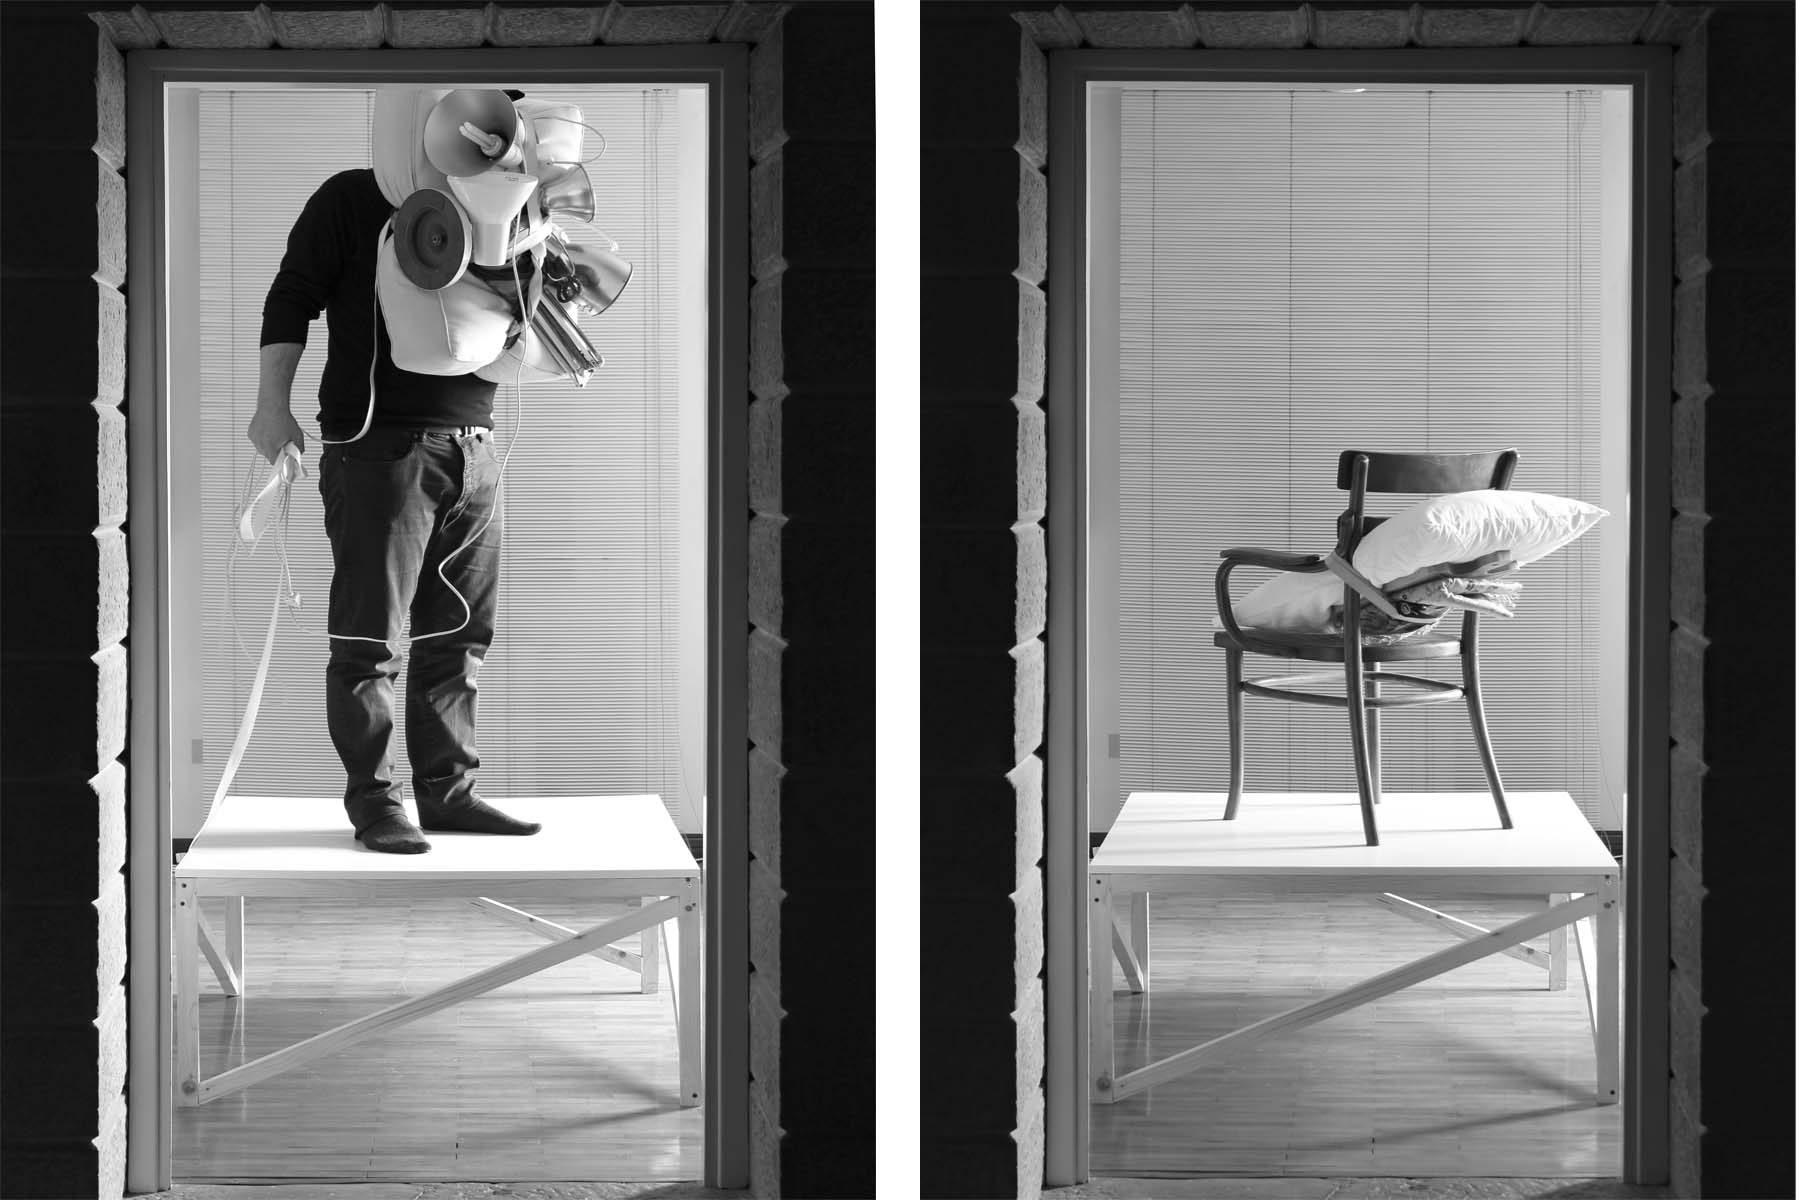 1Michele-Tajariol-Nothing-is-hidden-2014-stampa-fineart-su-carta-fotografica-31-x-43-cm-ciascuno